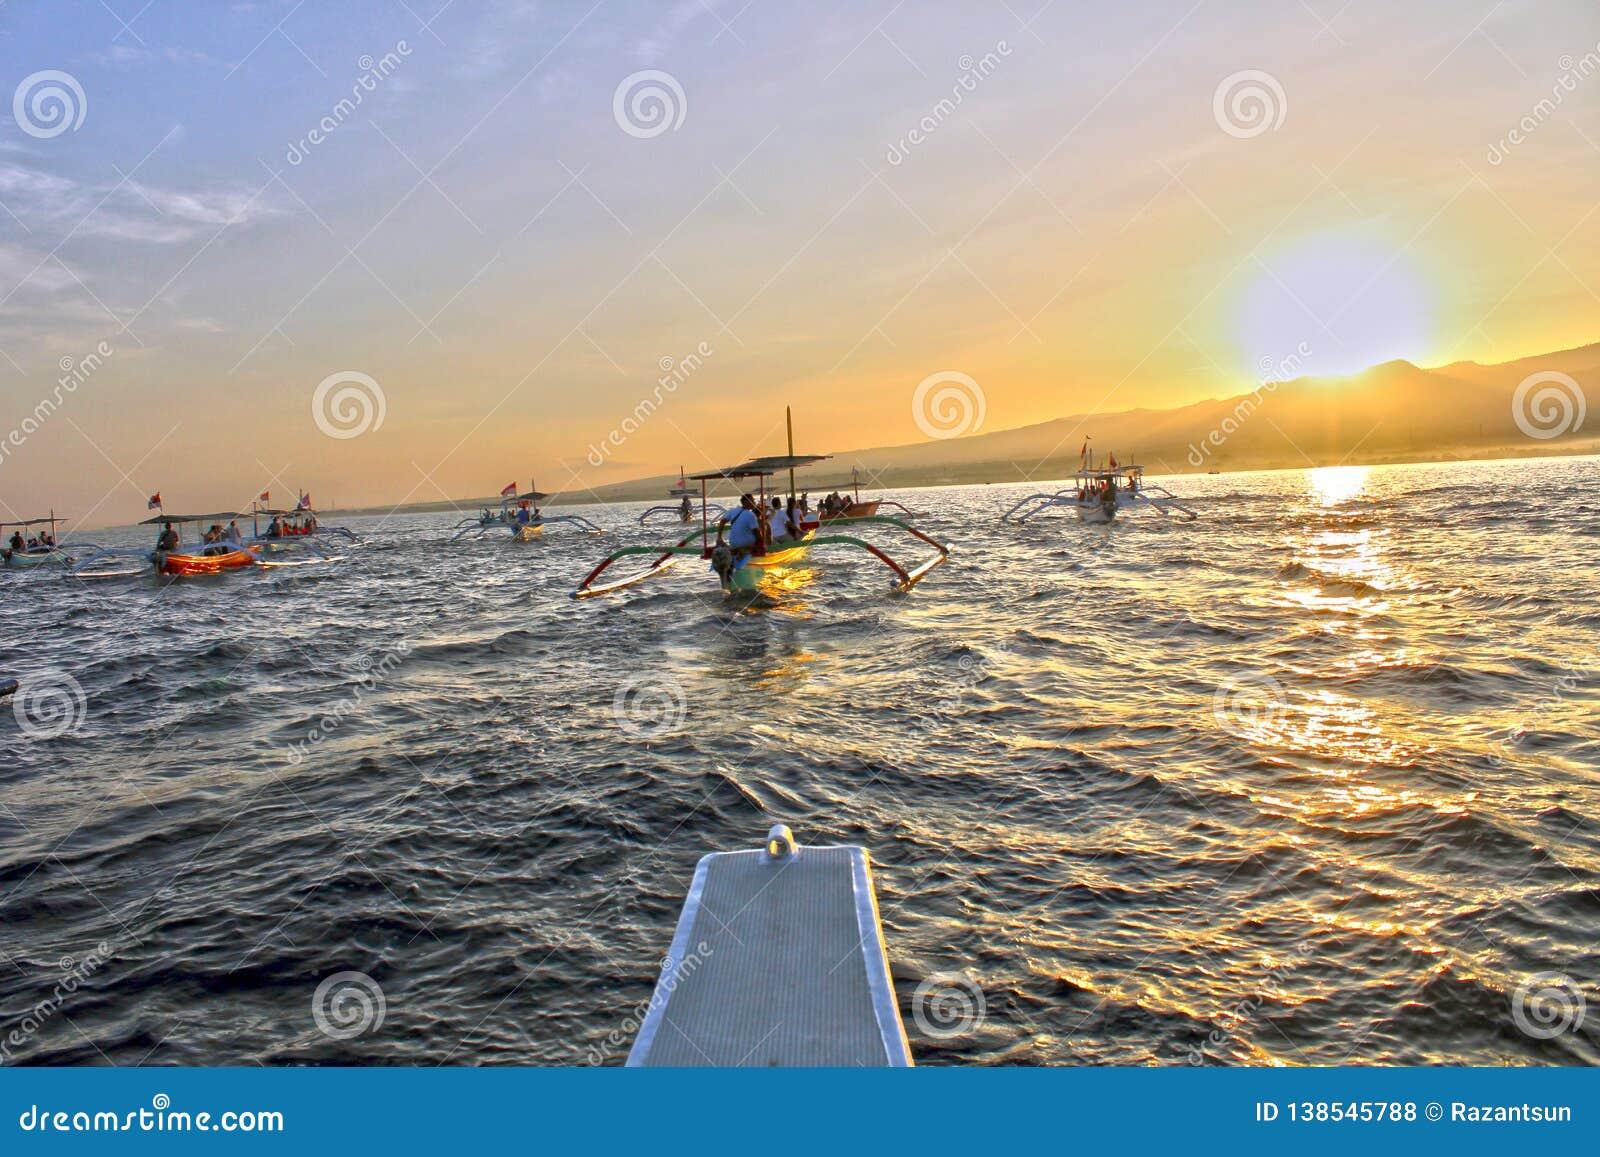 Race towards the sunrise